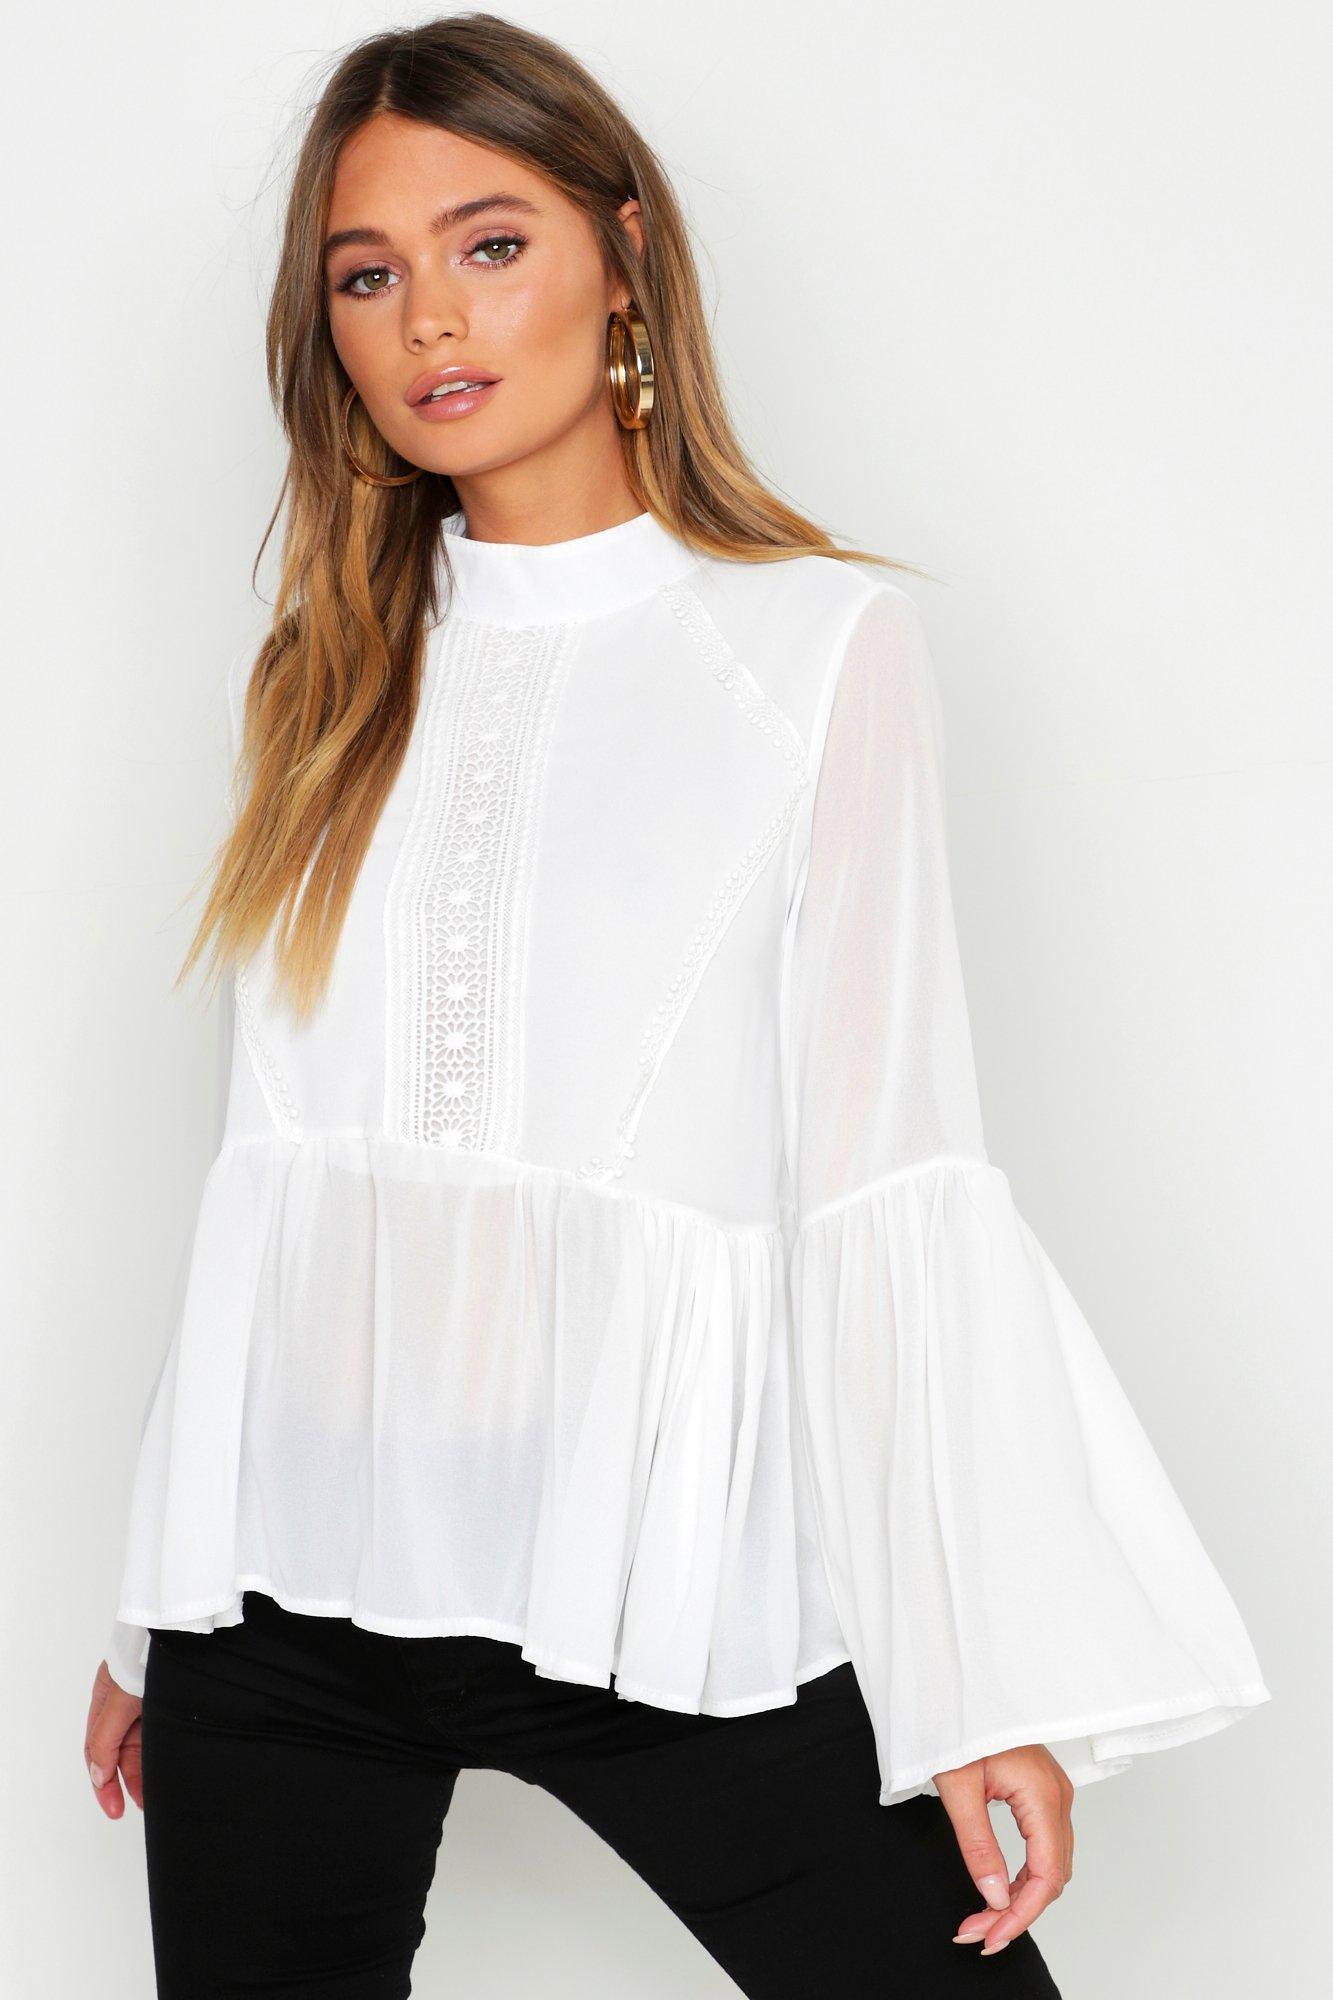 Women's 70s Shirts, Blouses, Hippie Tops Womens Woven Crochet Detail Pep Hem Blouse - white - 10 $12.80 AT vintagedancer.com